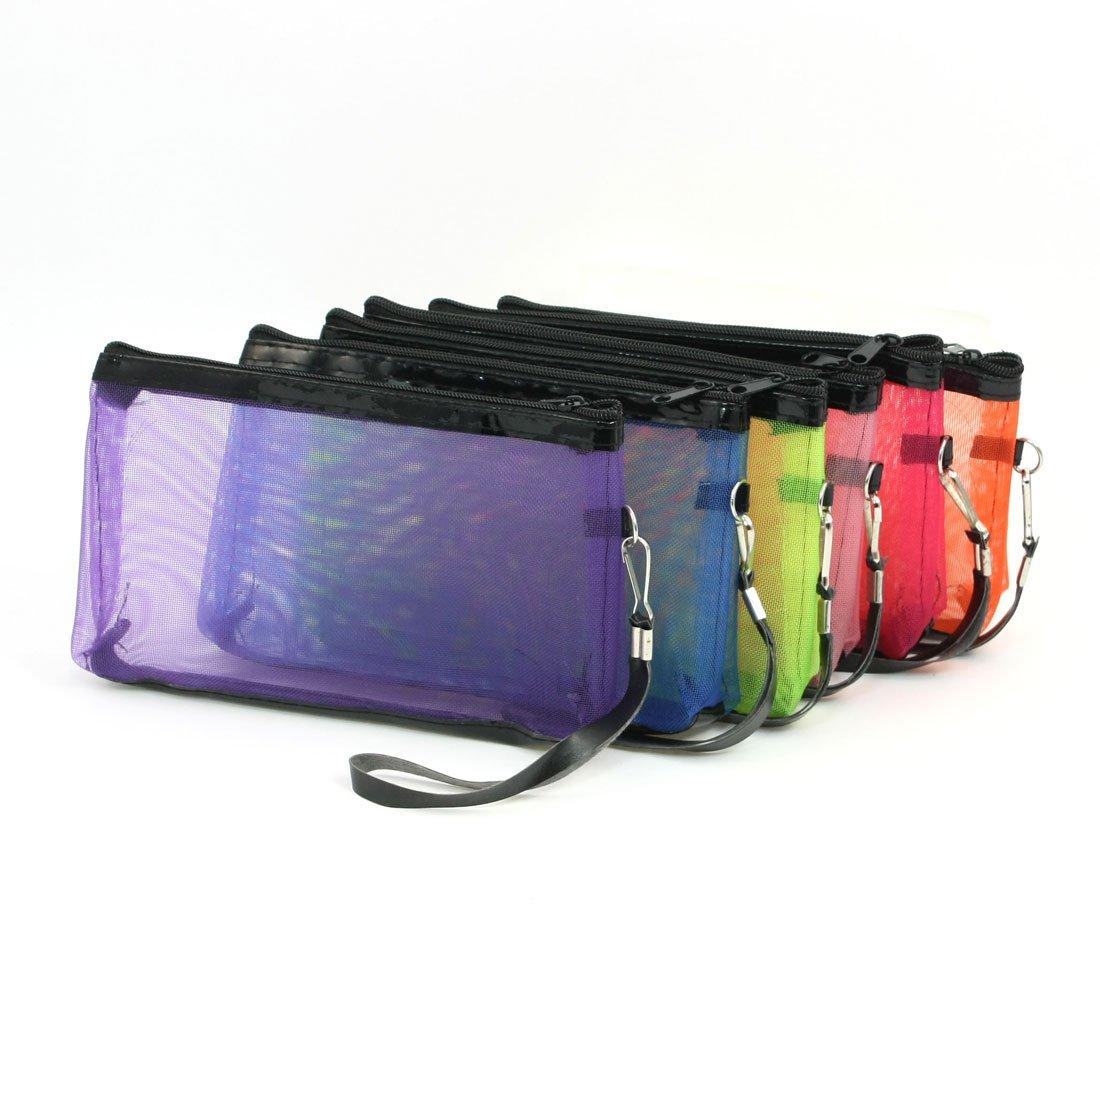 Small Mesh Travel Bags